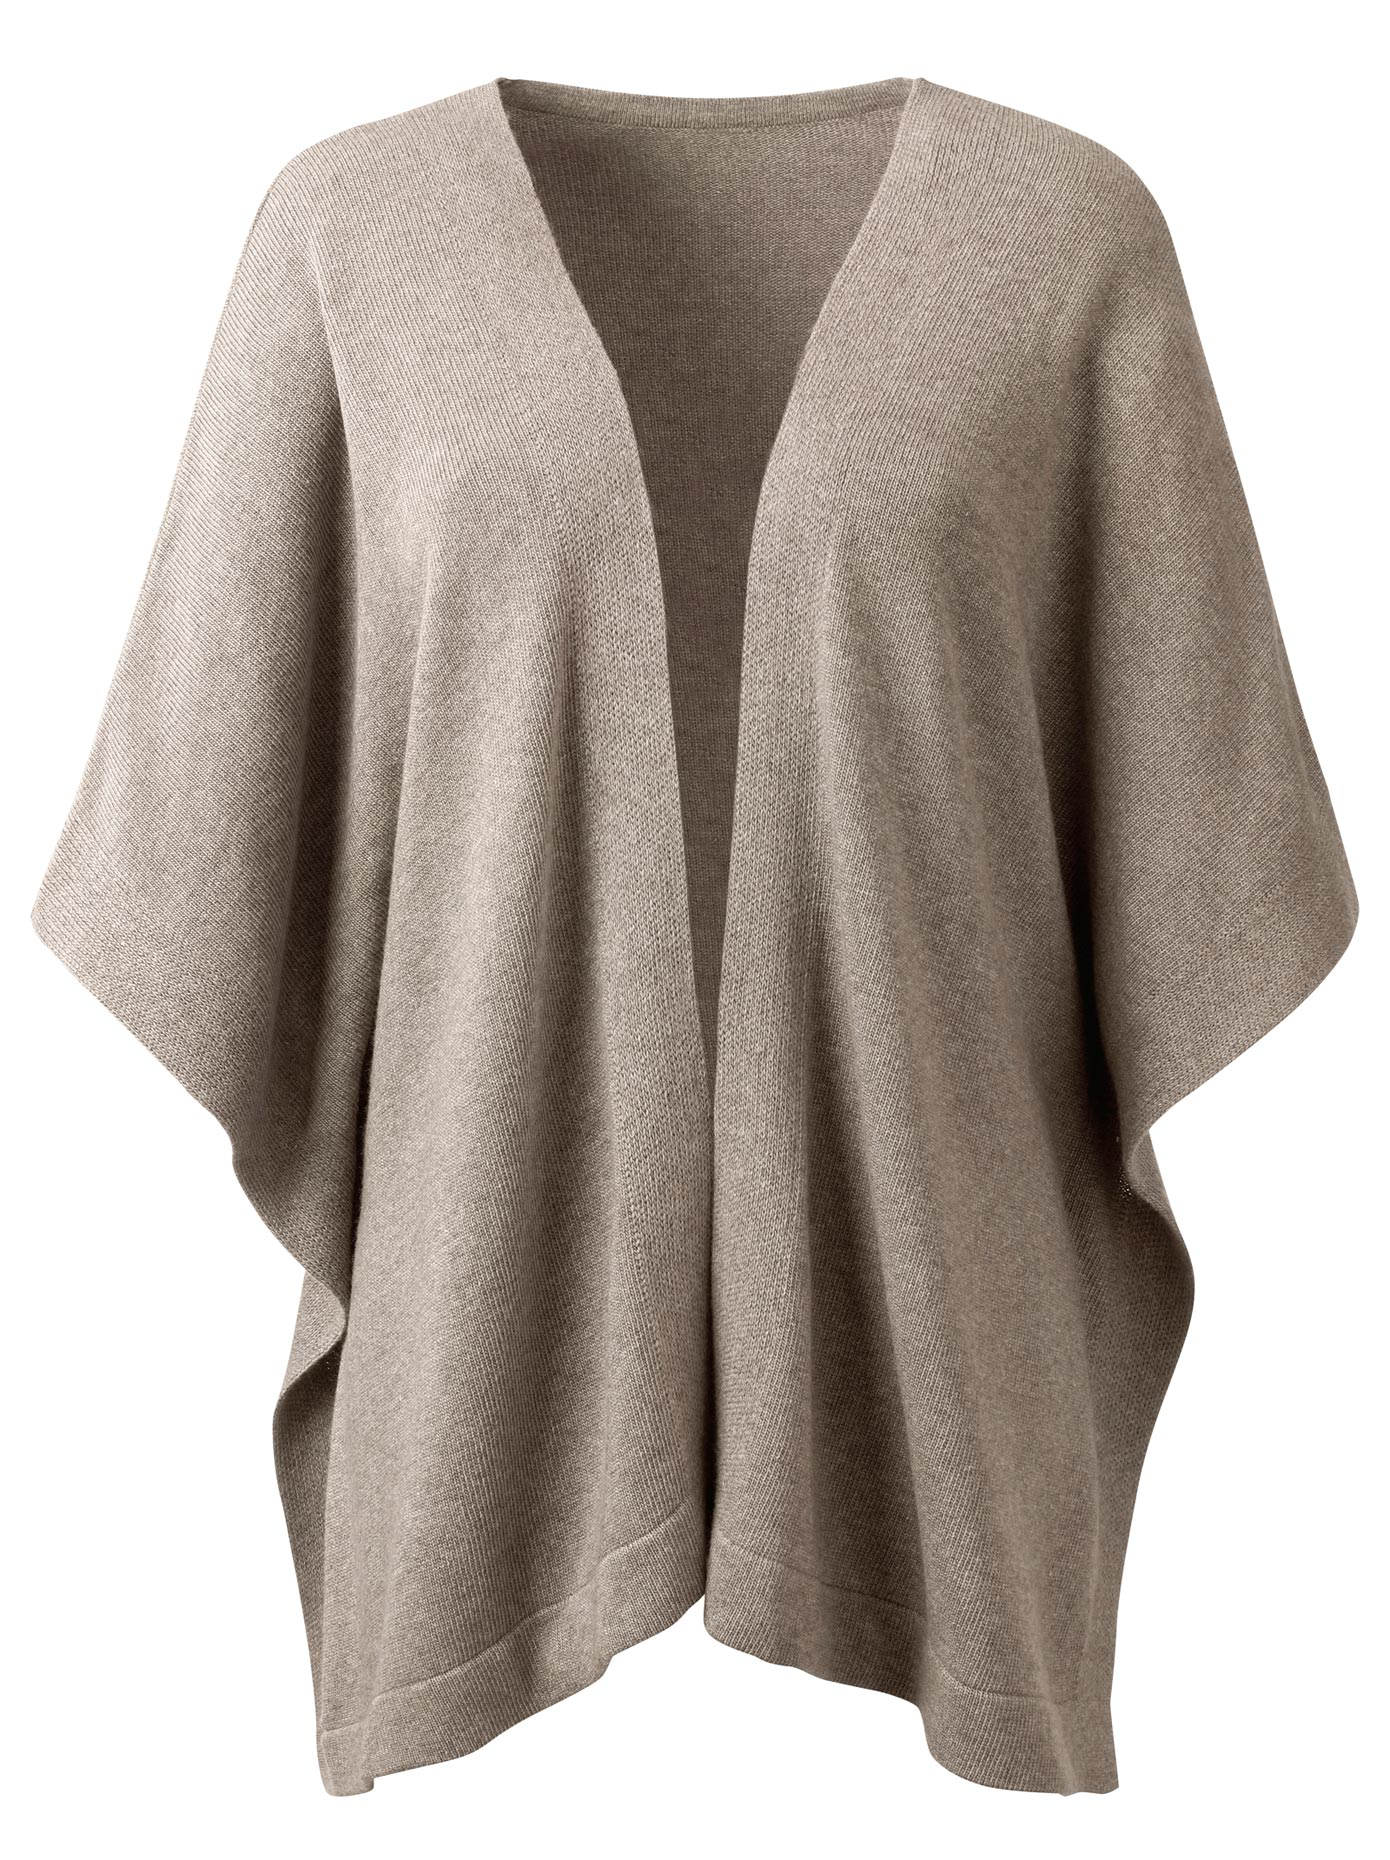 Lady Strickponcho in erstklassiger Qualität | Bekleidung > Pullover > Ponchos & Capes | Lady